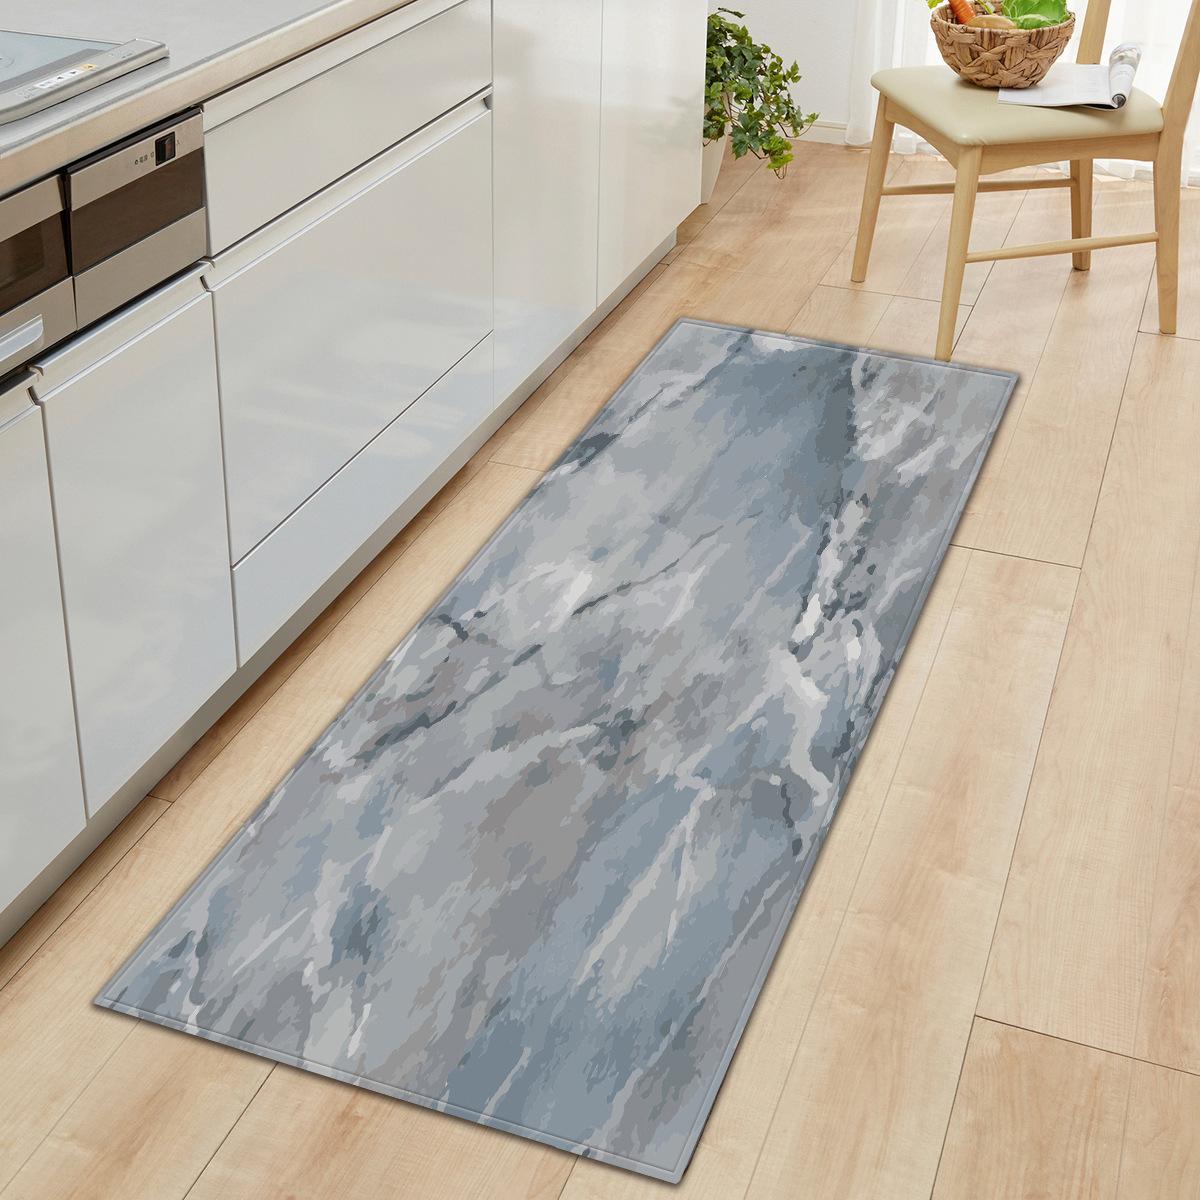 Marmo Cucina divano armadio Scarpiera Carpet Mat Lungo